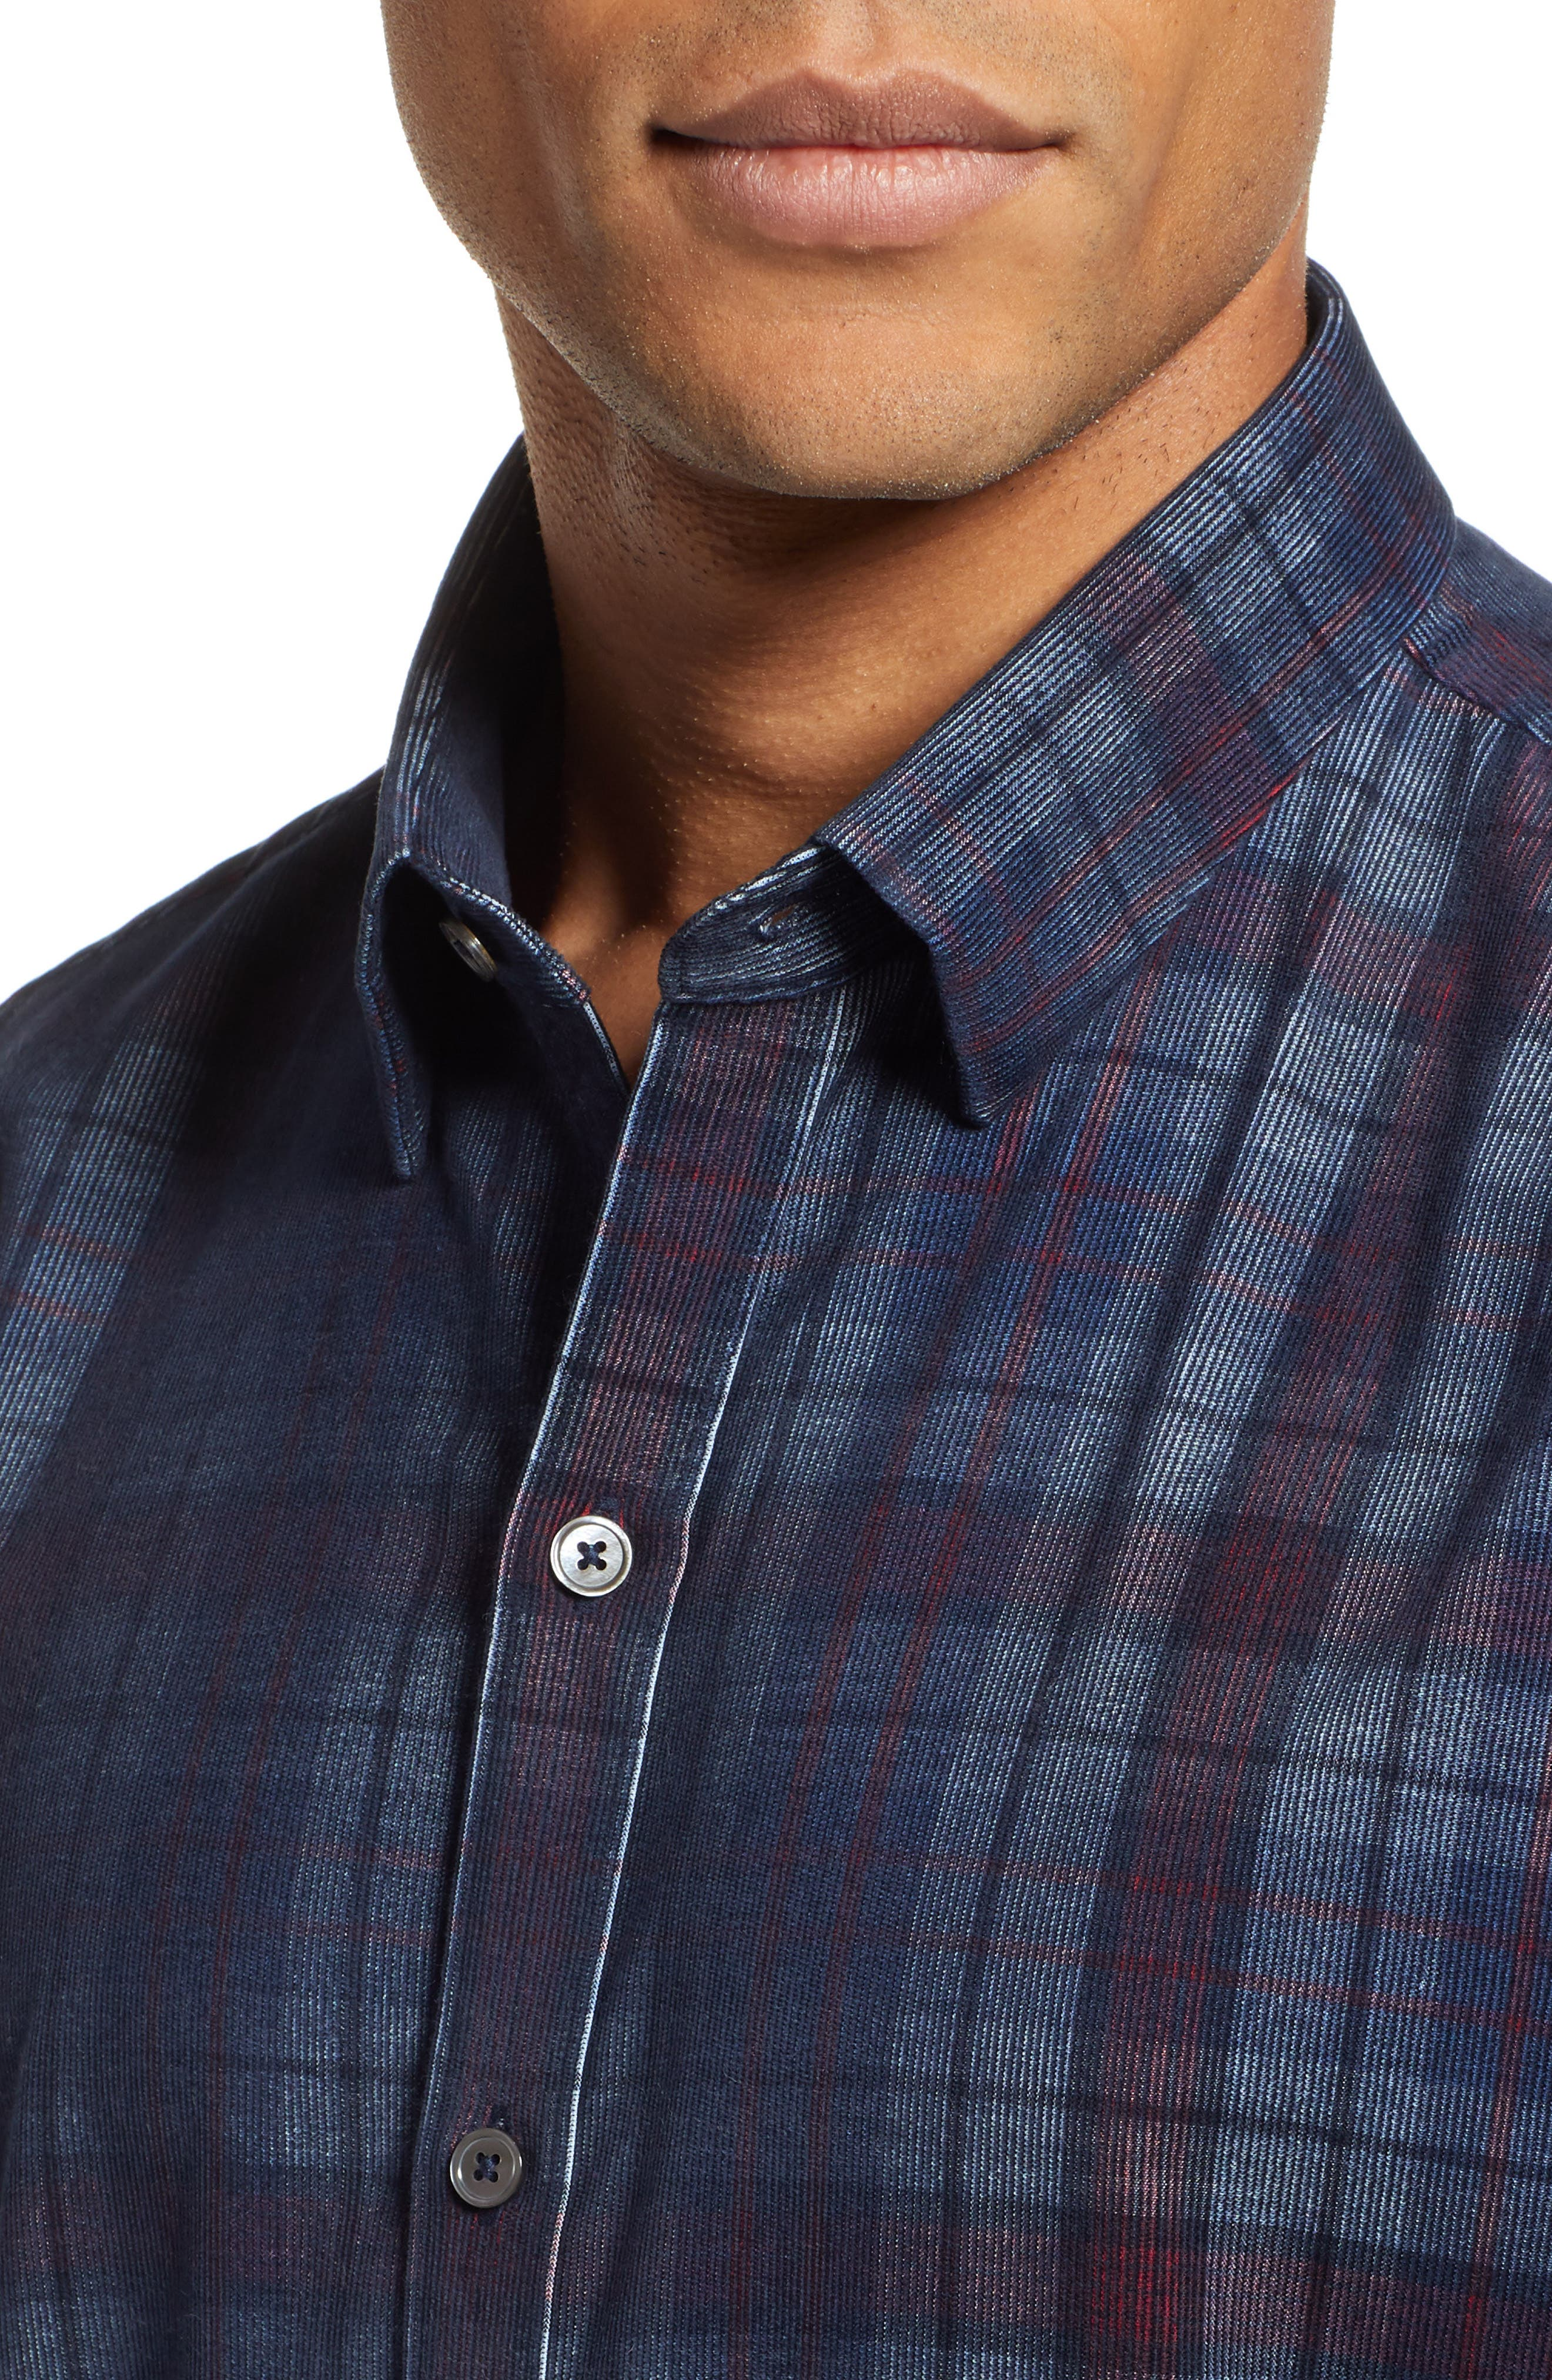 Lemke Regular Fit Corduroy Sport Shirt,                             Alternate thumbnail 2, color,                             NAVY